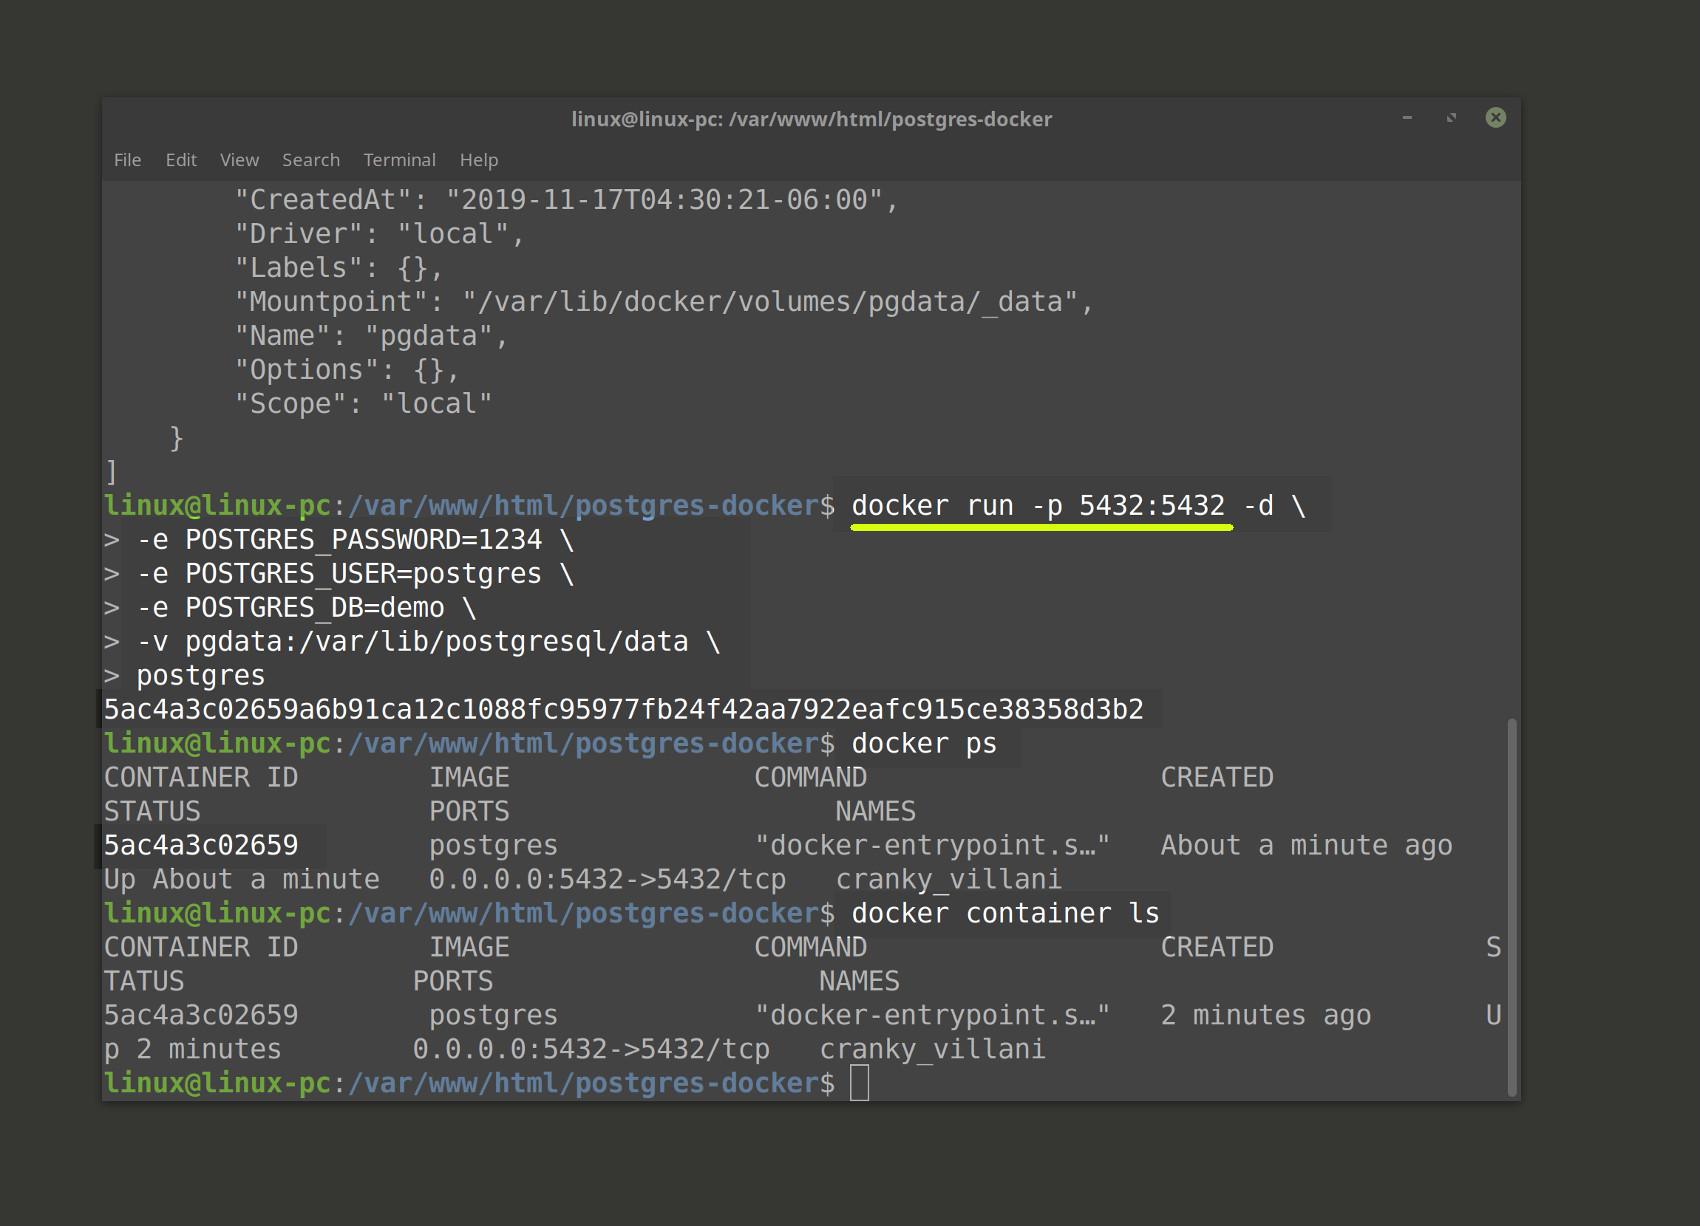 Screenshot of docker run command to run Postgres container with port binding